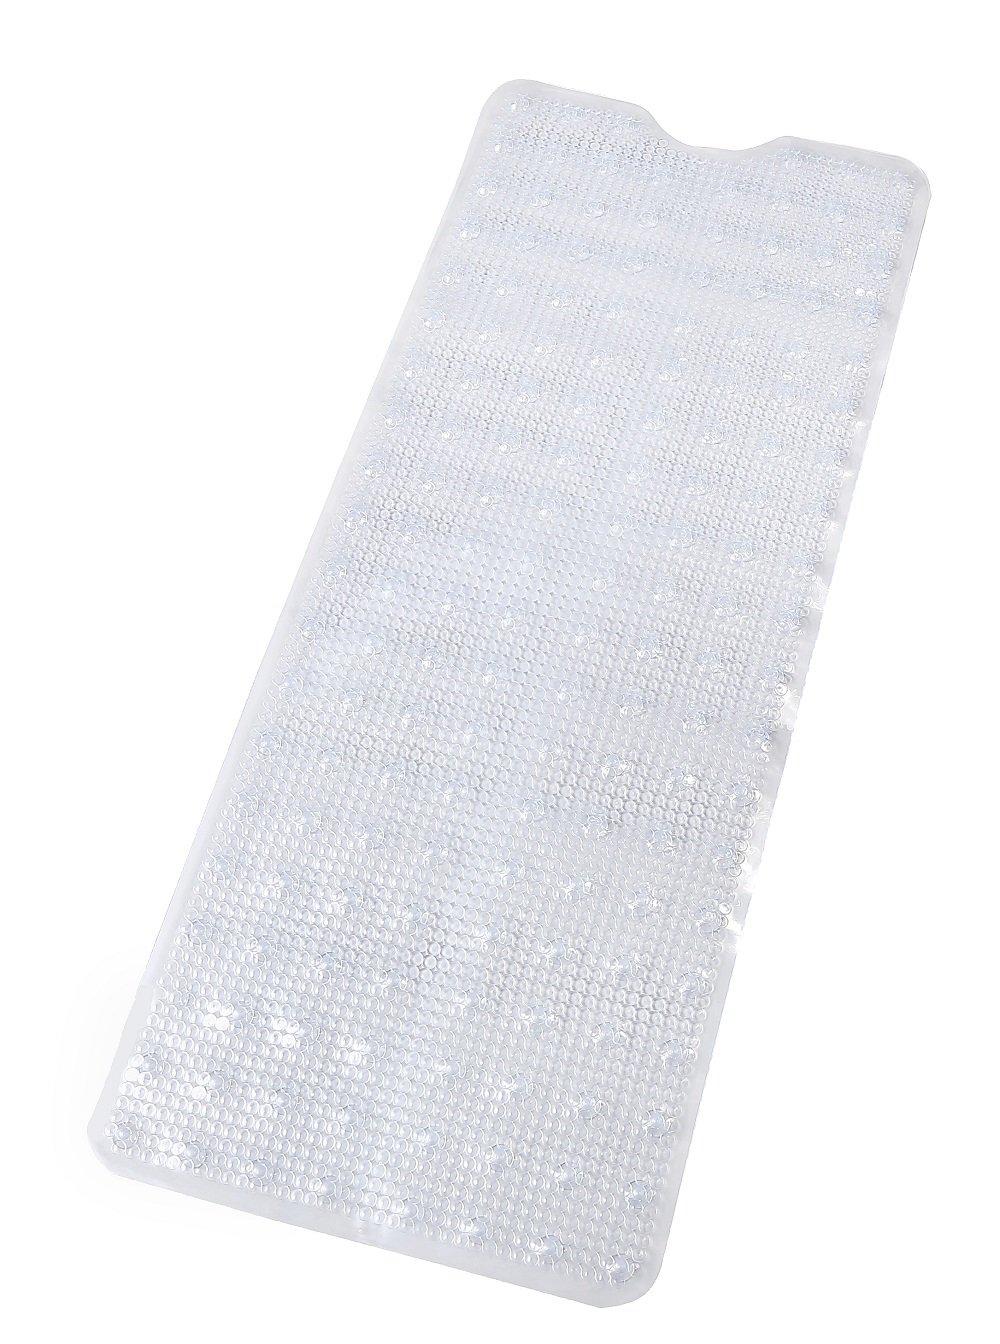 "Moon Castle Non-Slip Extra Long Pebbled Shower Mat, Machine Washable, Mildew Resistant, Rectangle 39"" x 16"", Clear"